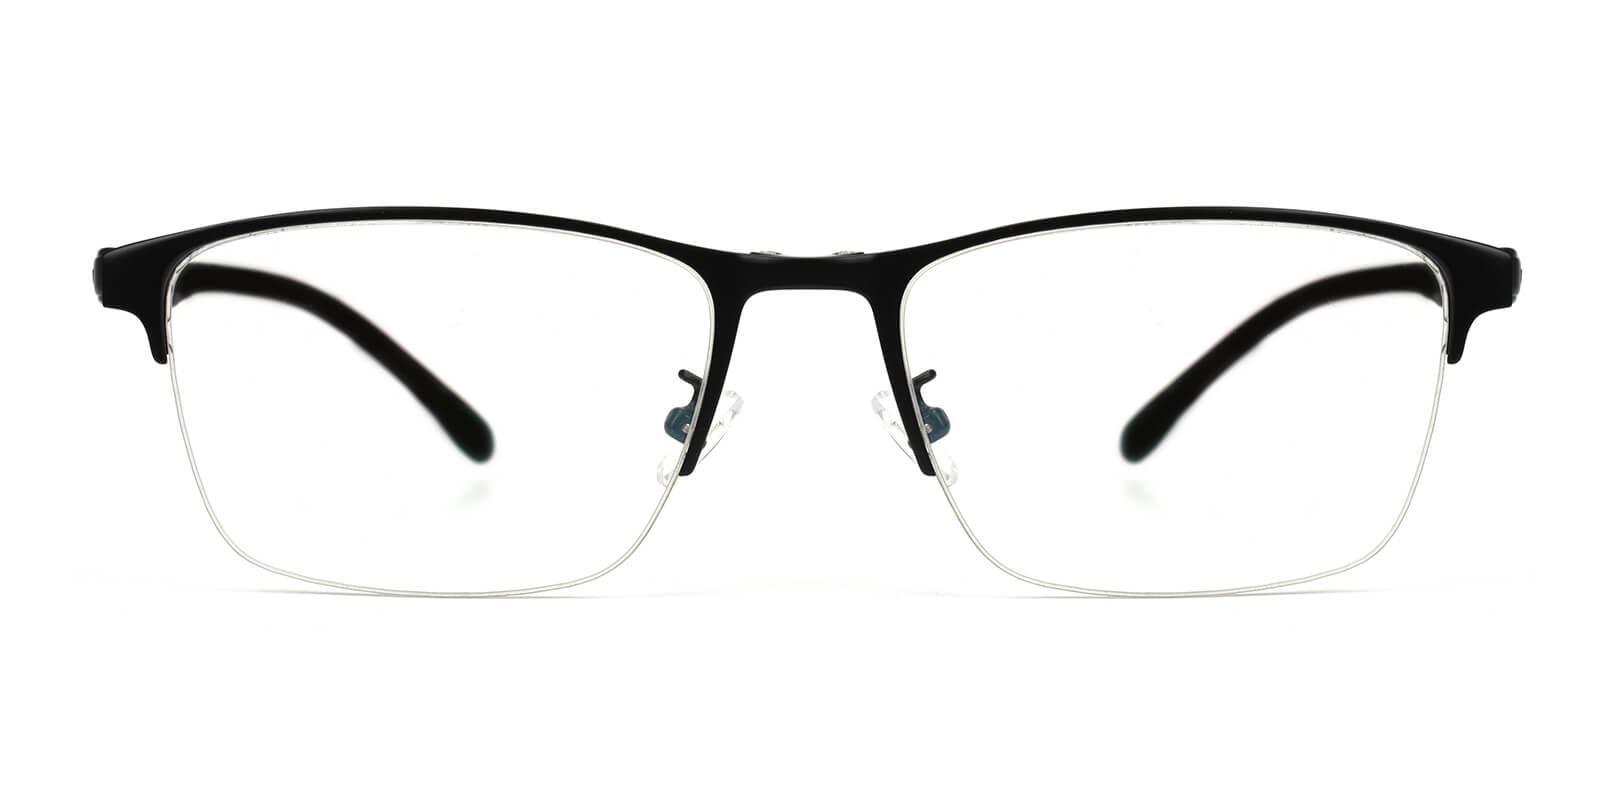 Erisy-Black-Rectangle-Metal-Eyeglasses-additional2